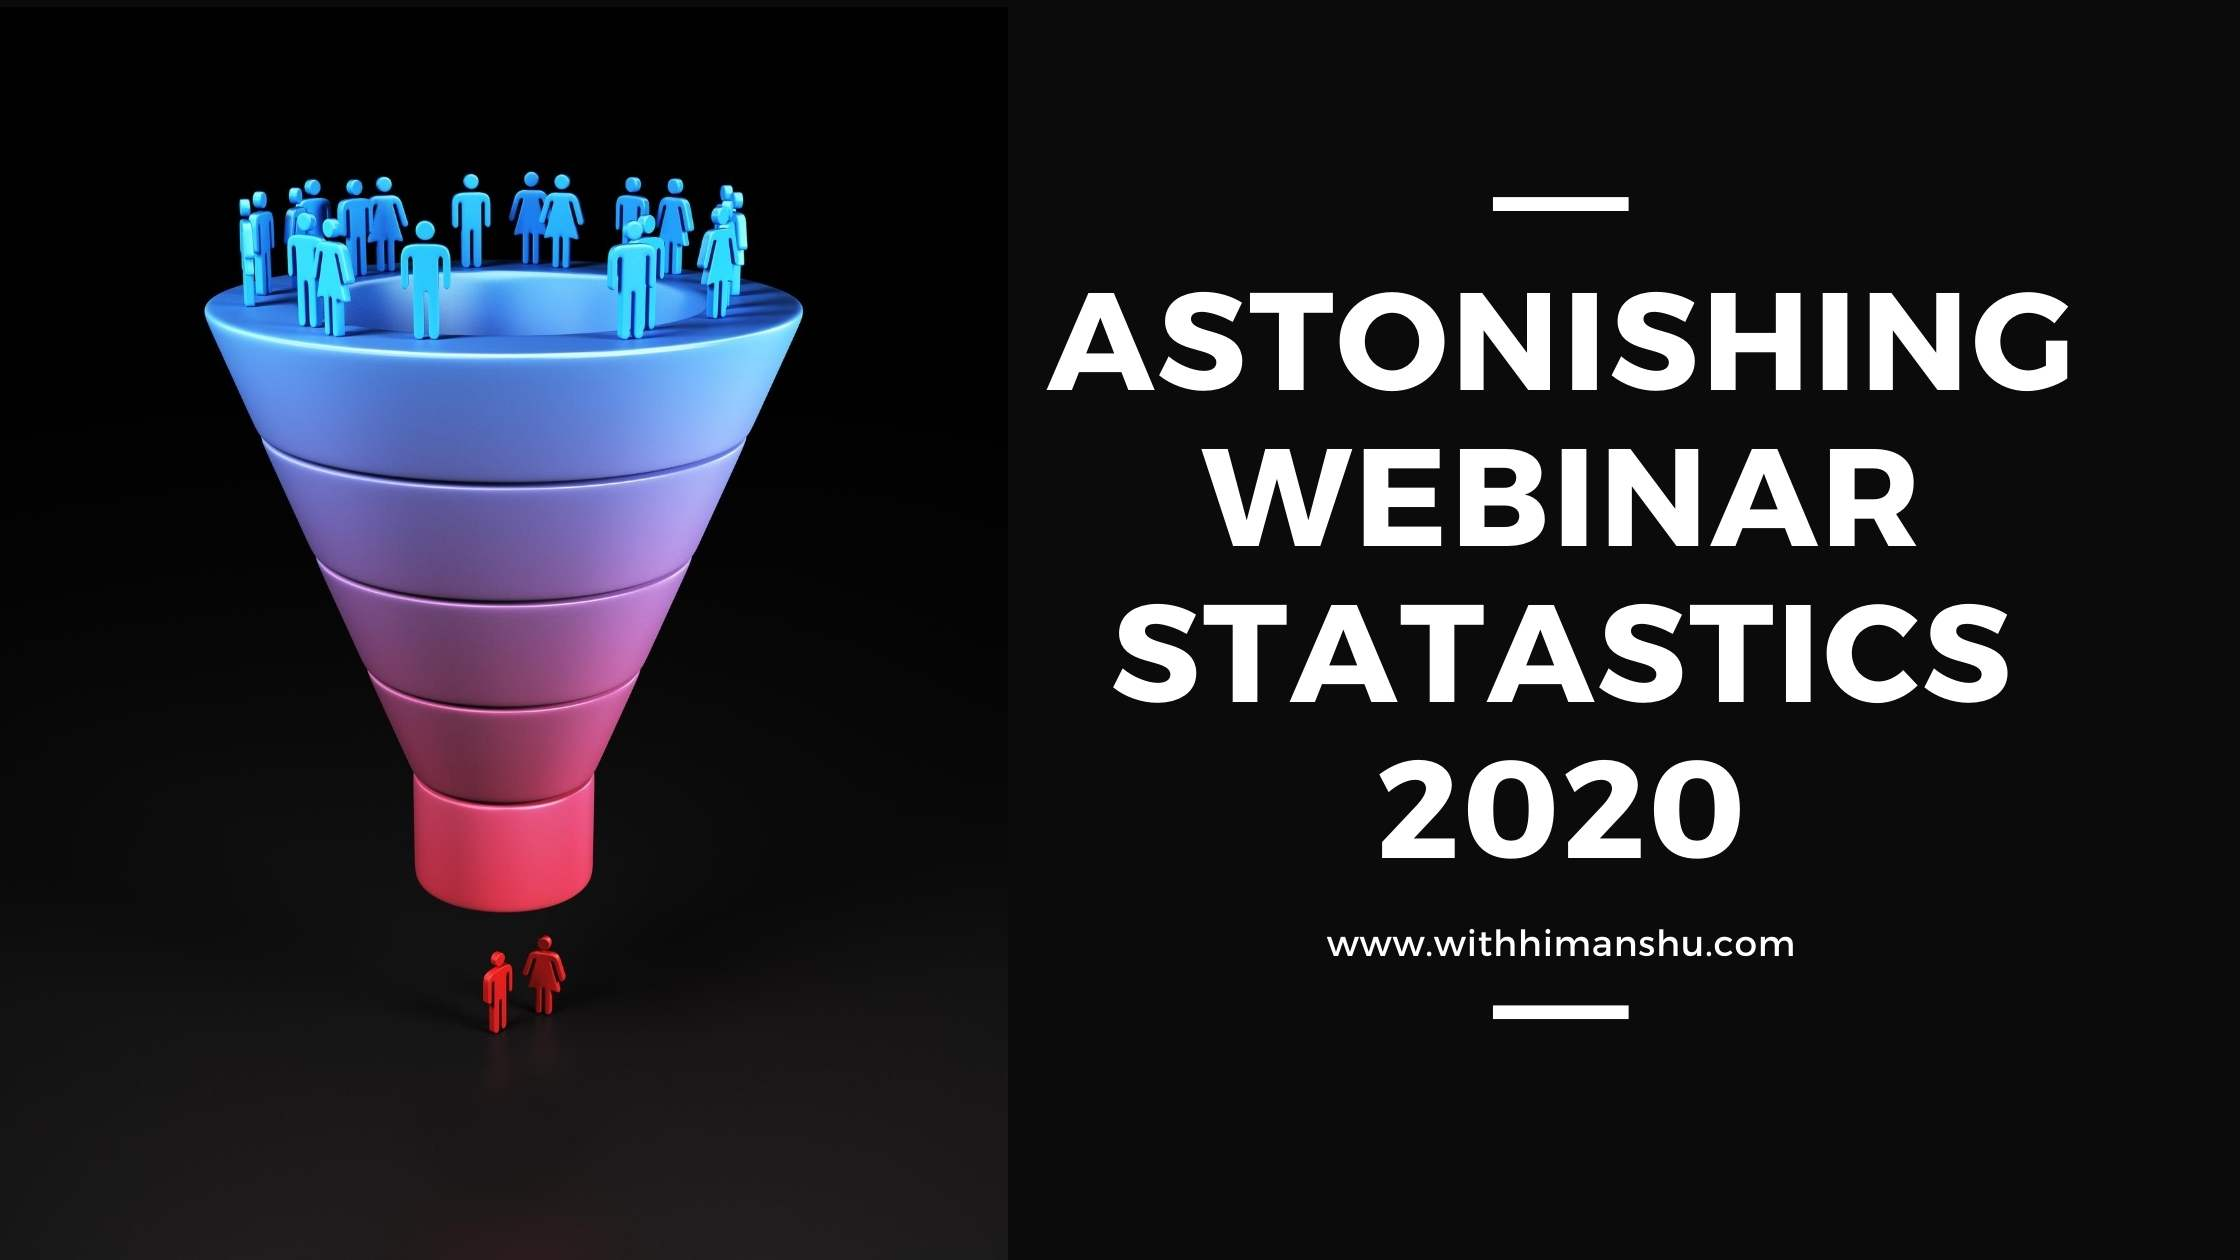 webinar statastics - featured image